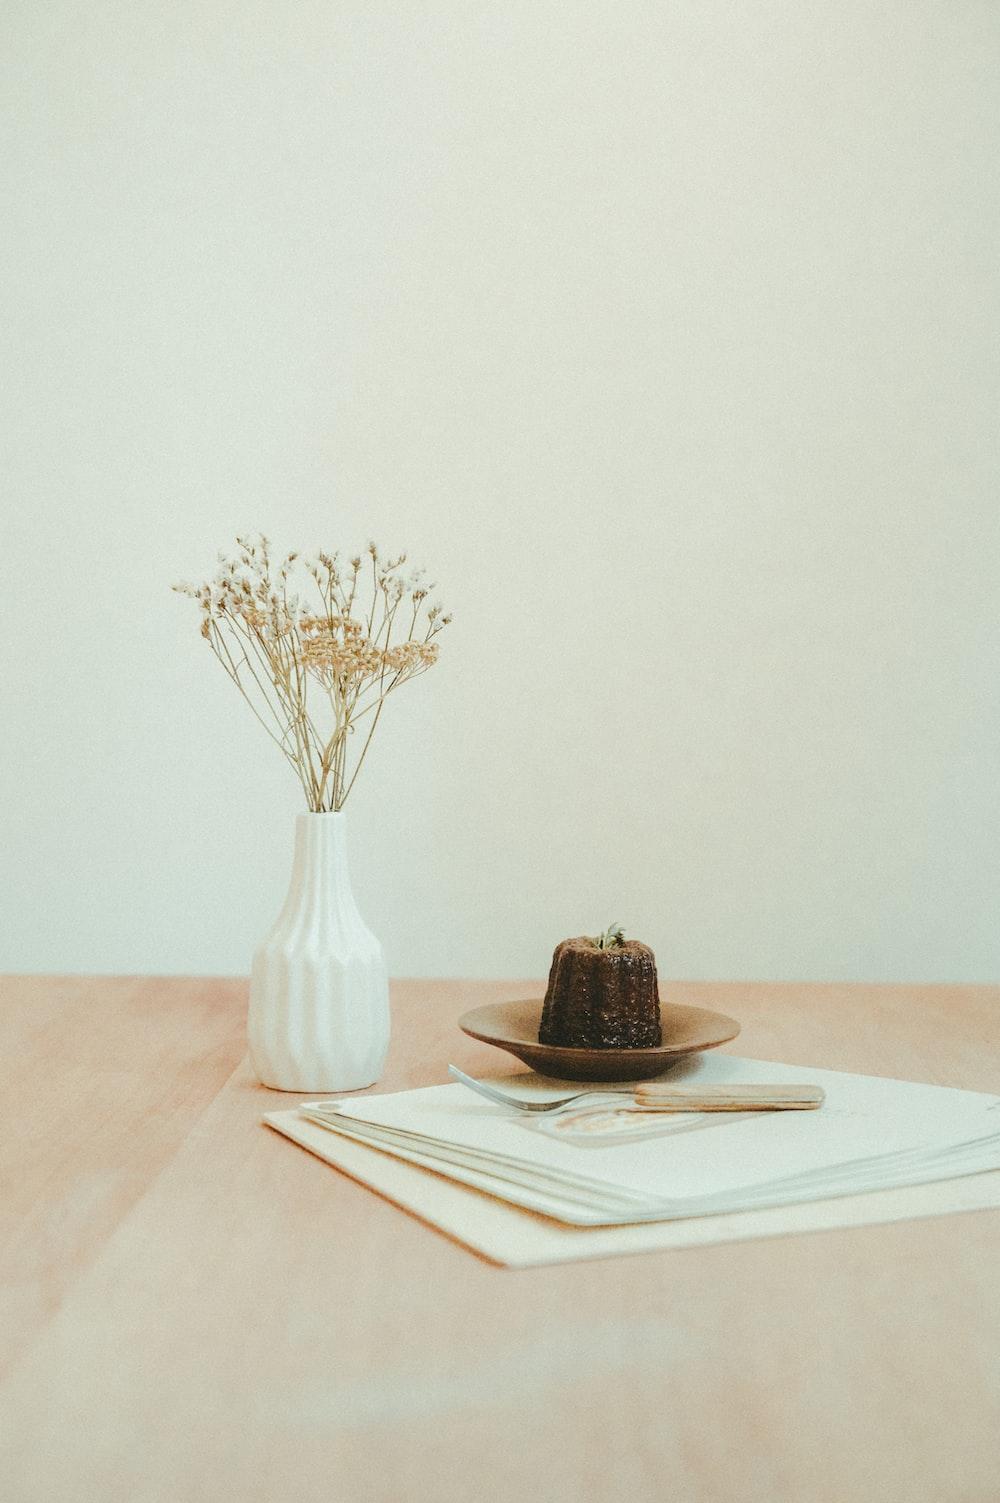 brown and black chocolate cake on white ceramic plate